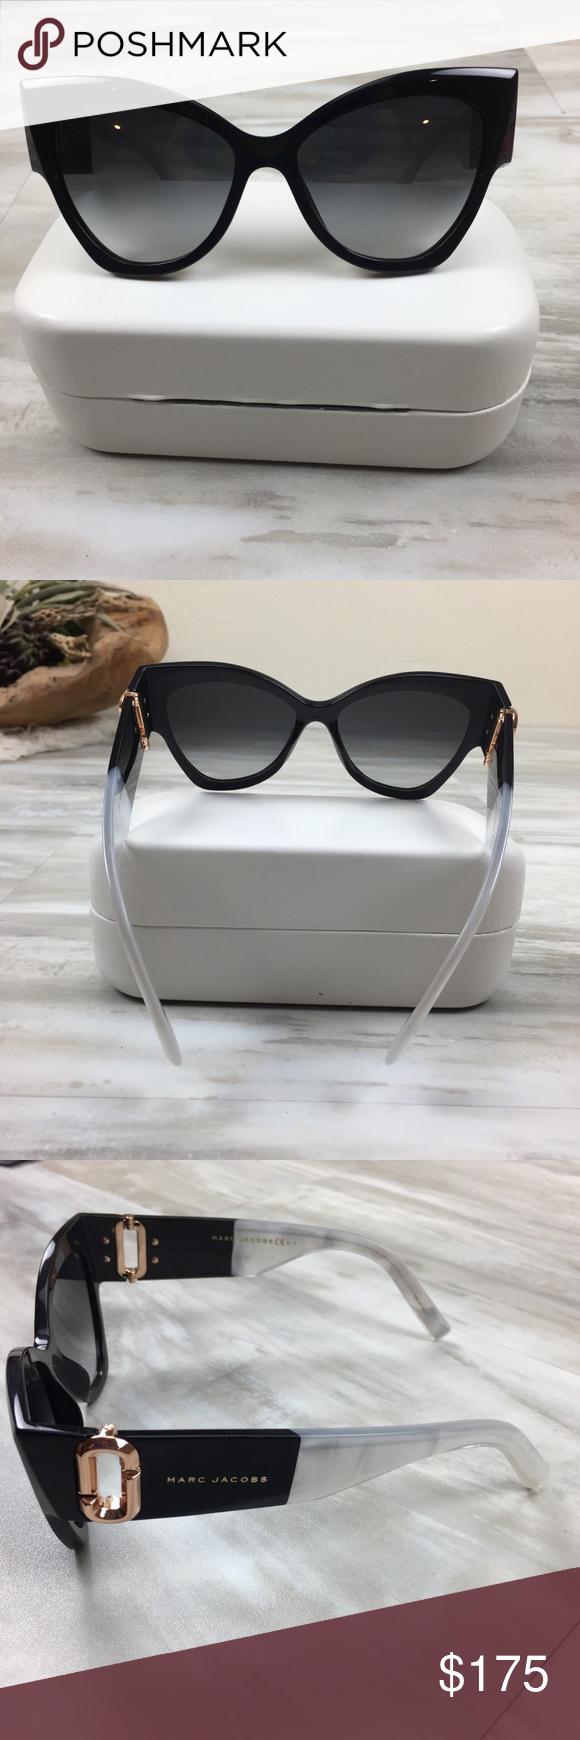 b0dee674593 Marc Jacobs 55mm Cateye Sunglasses Black   Pearl Brand new in original  packaging. Cat eye